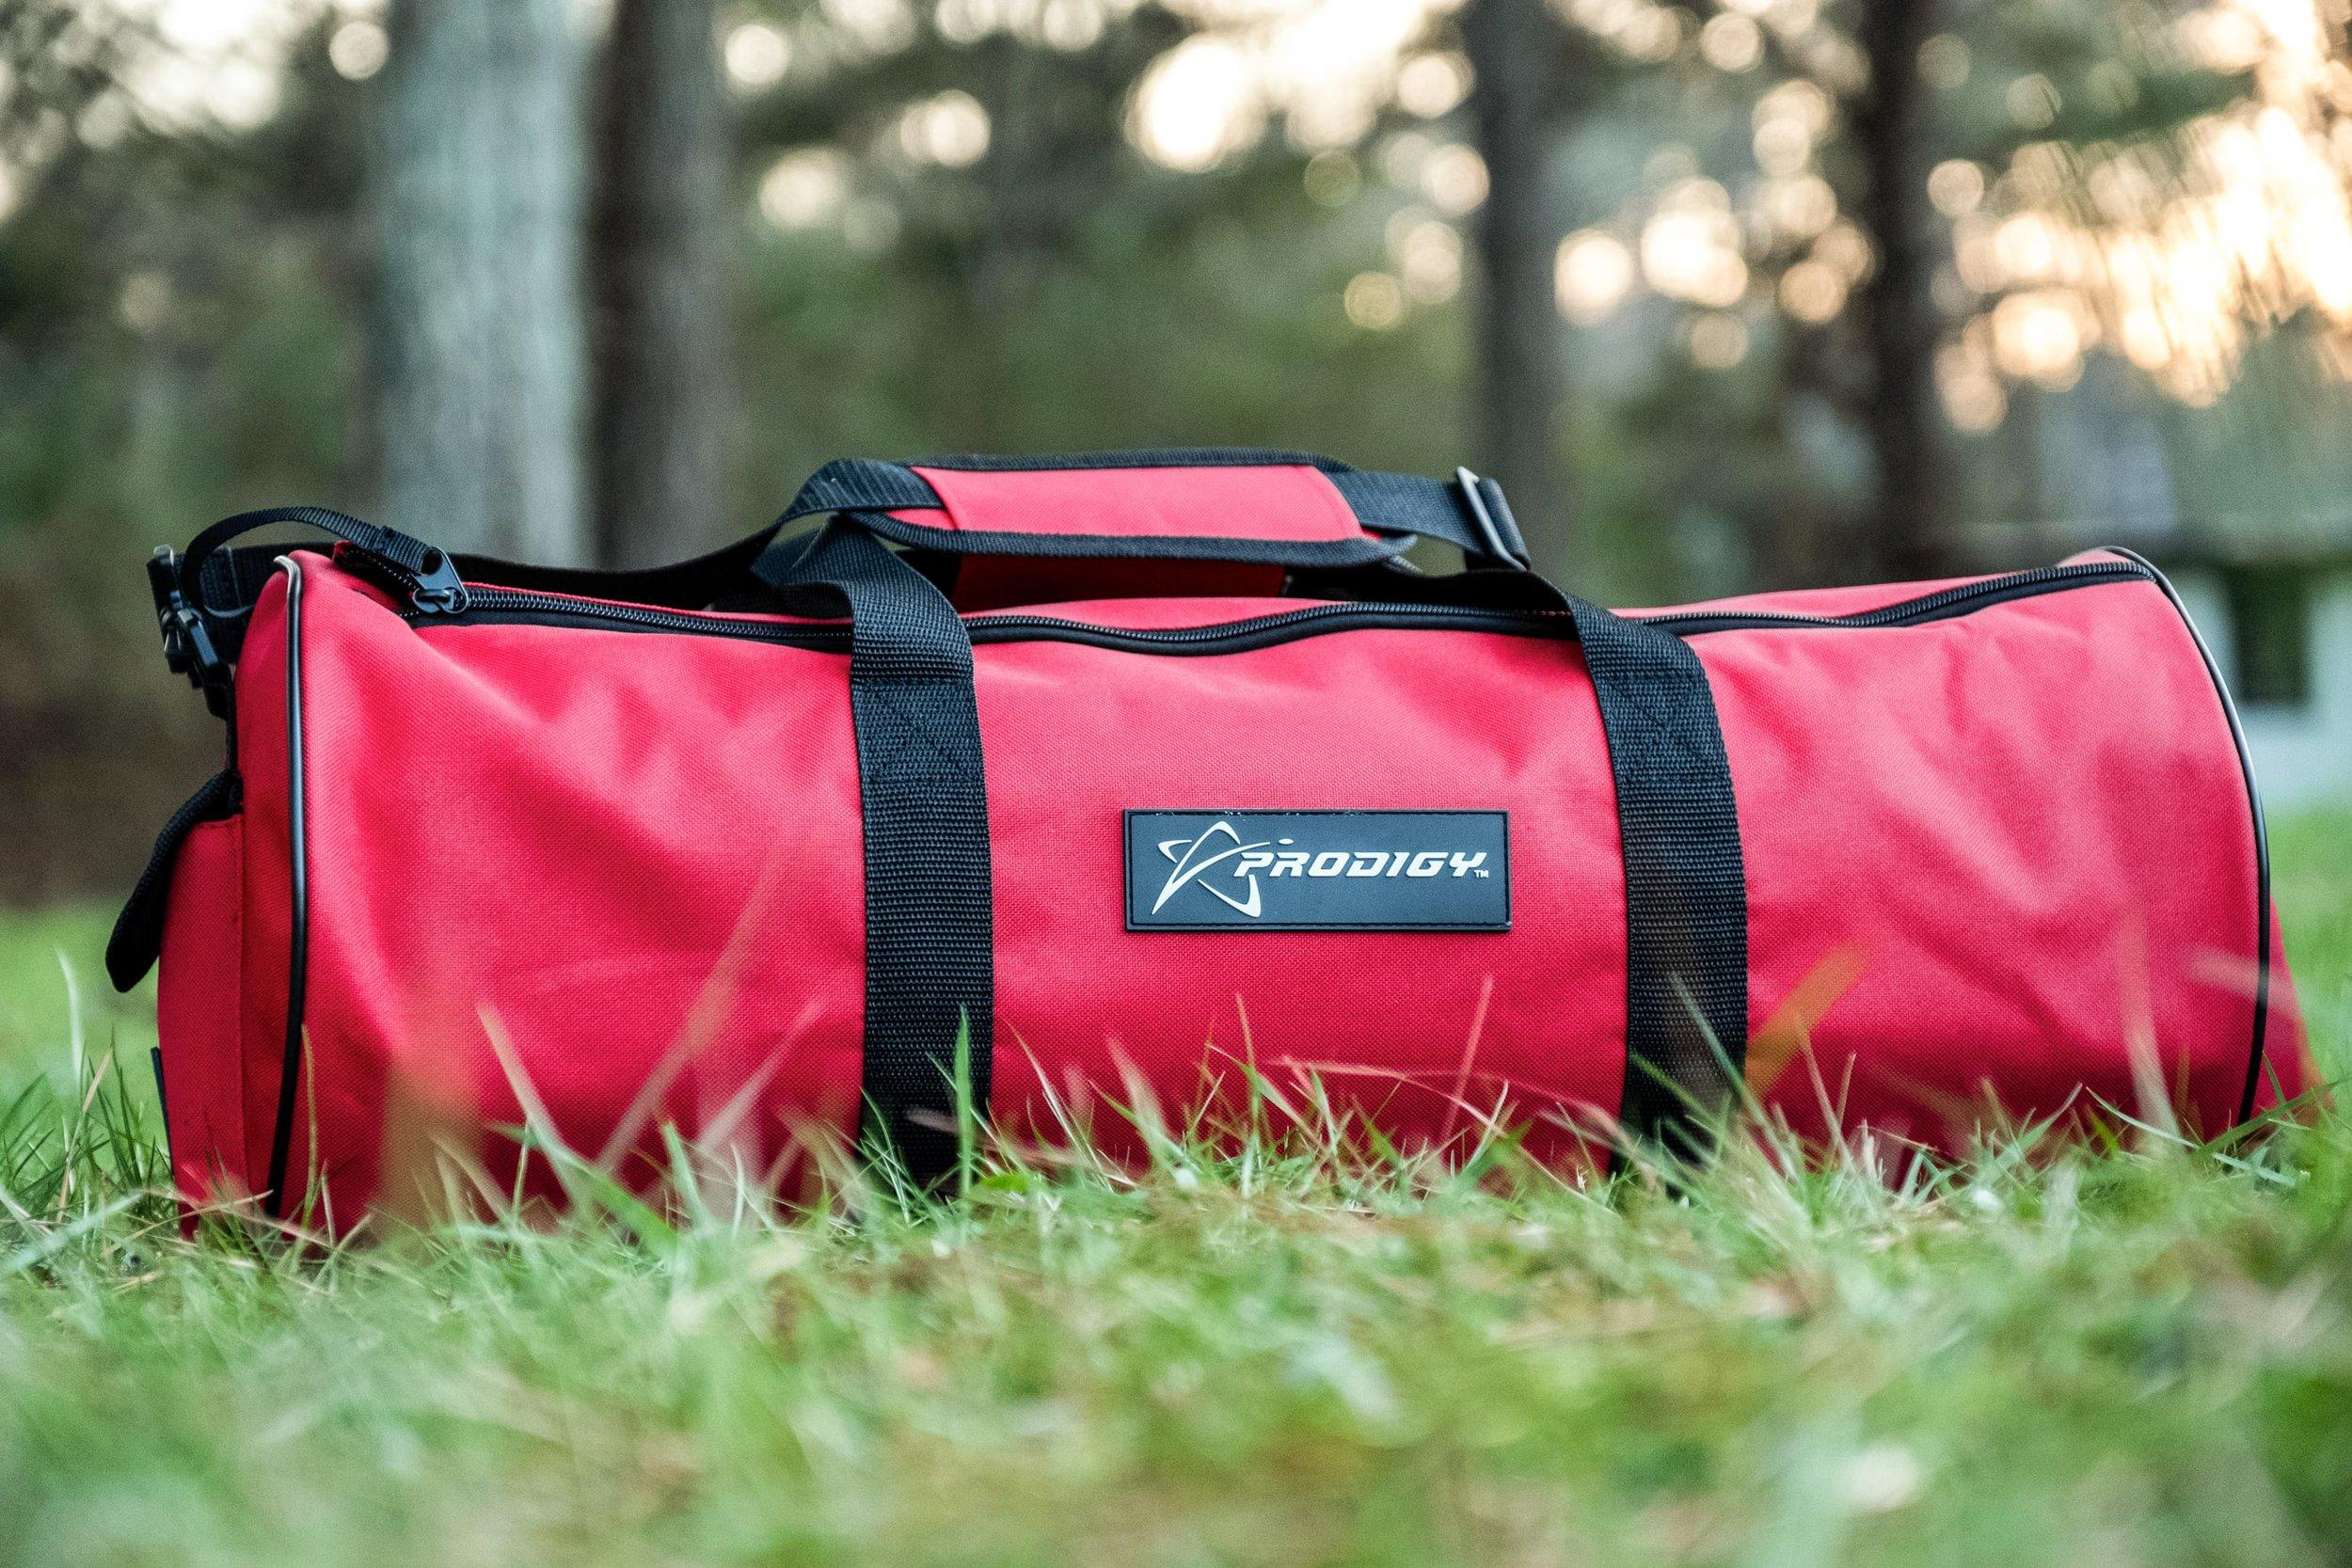 prodigy-practice-bag-v2-lifestyle-5_OPT.jpg